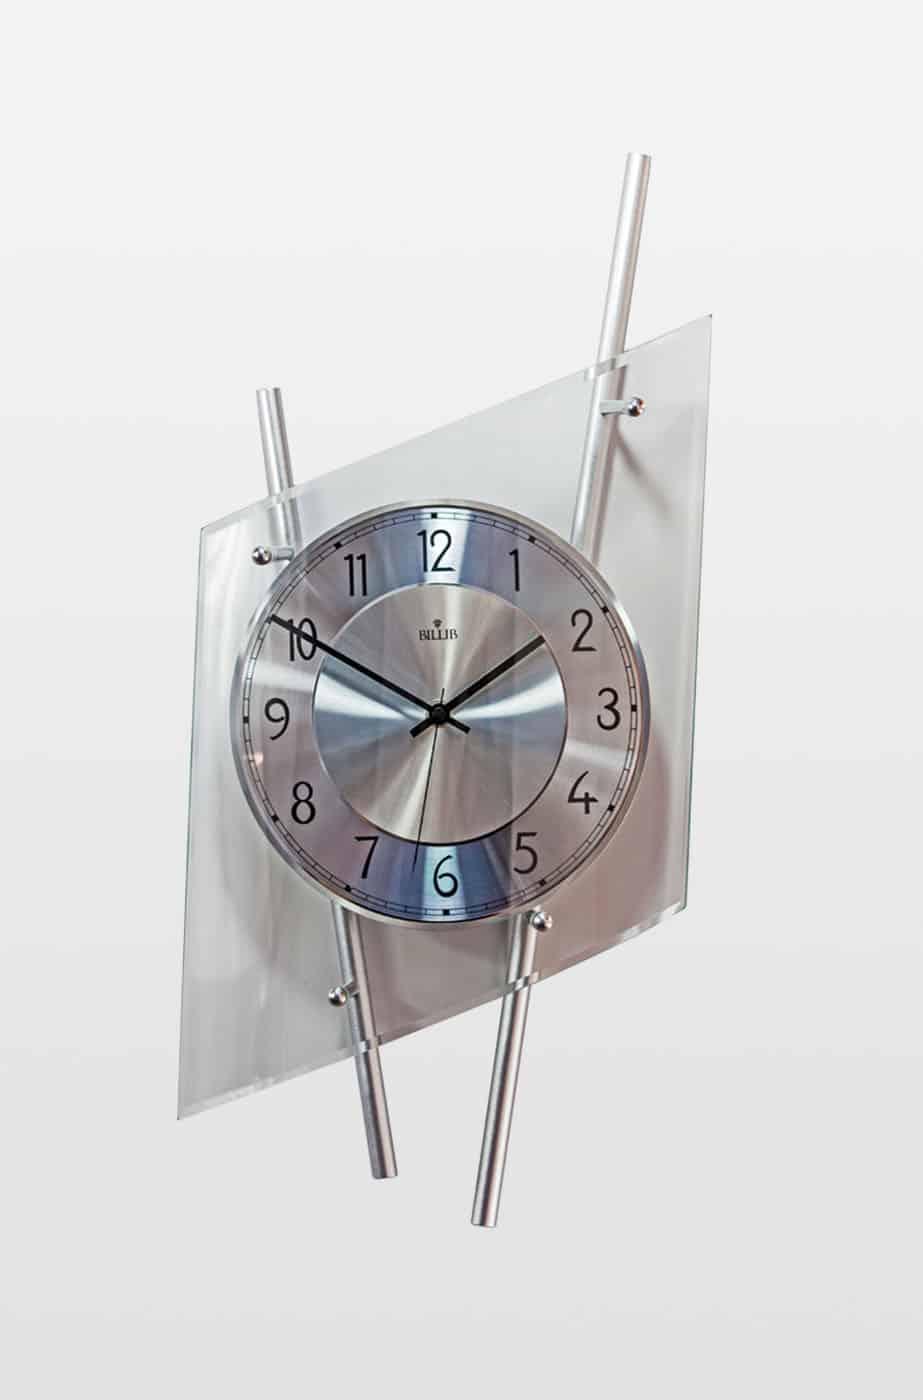 QC-9150 Radio Controlled Clock